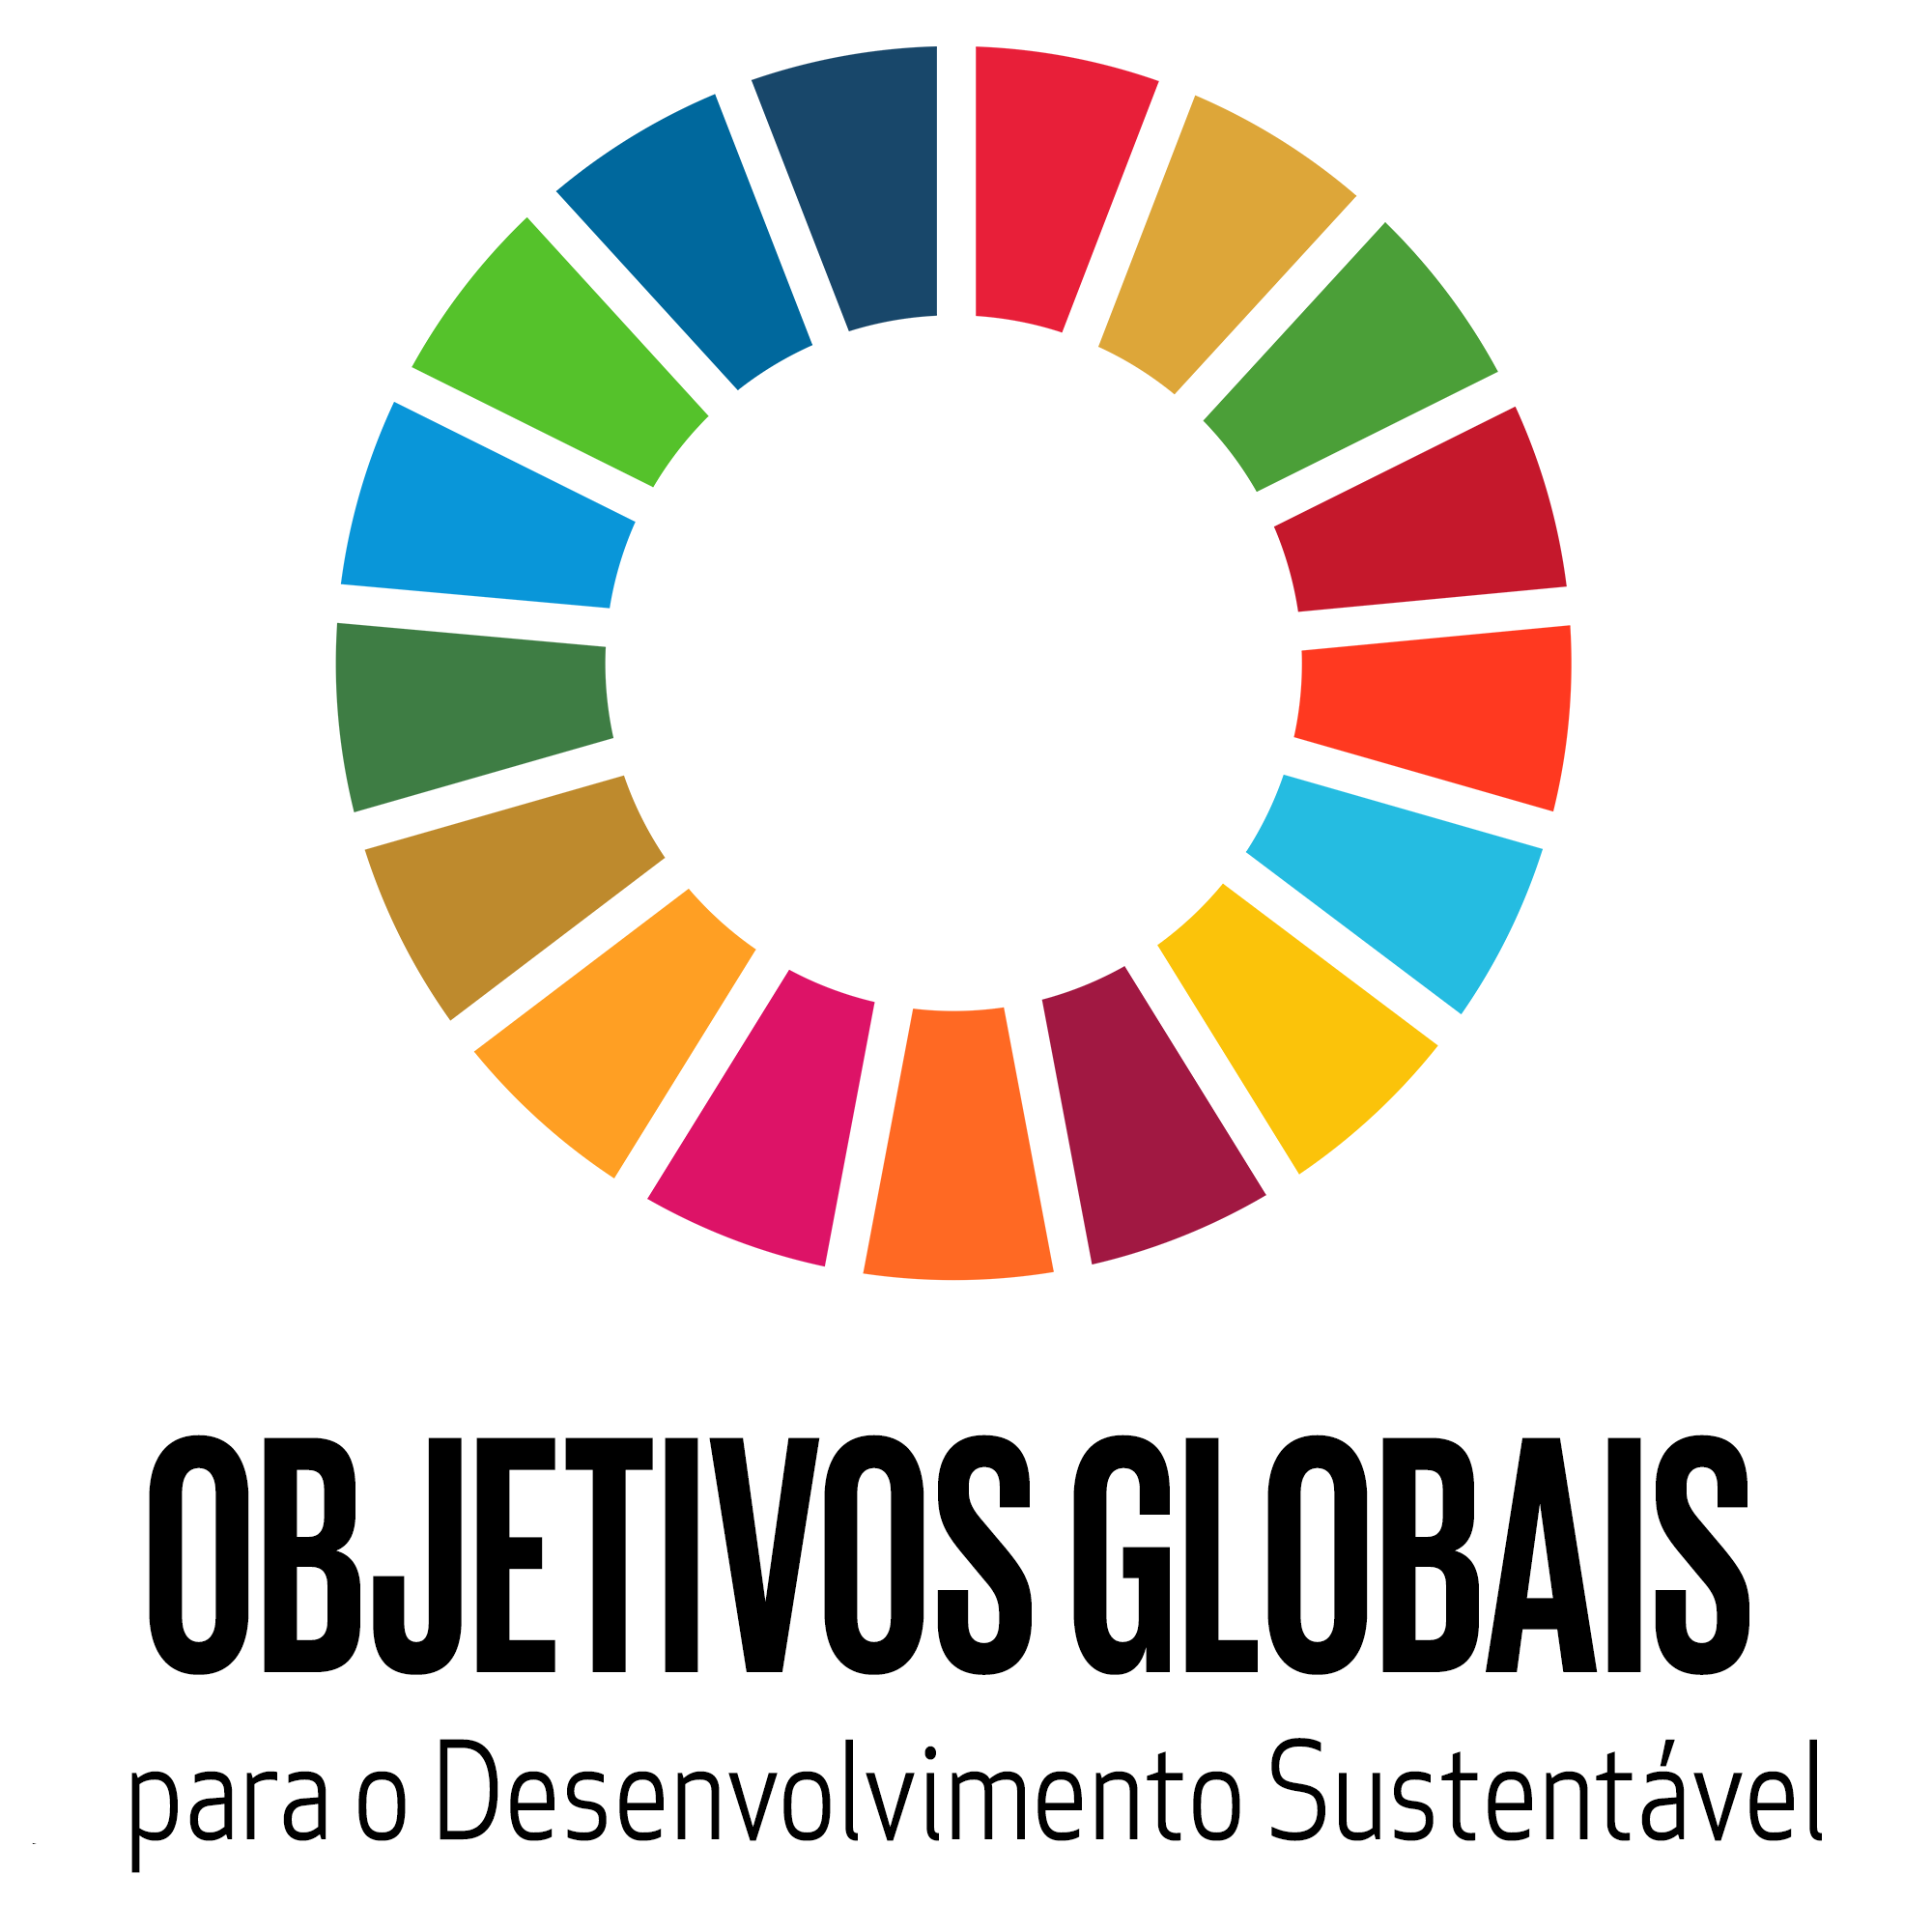 objetivos_globais_-_Copia_-_Copia.png